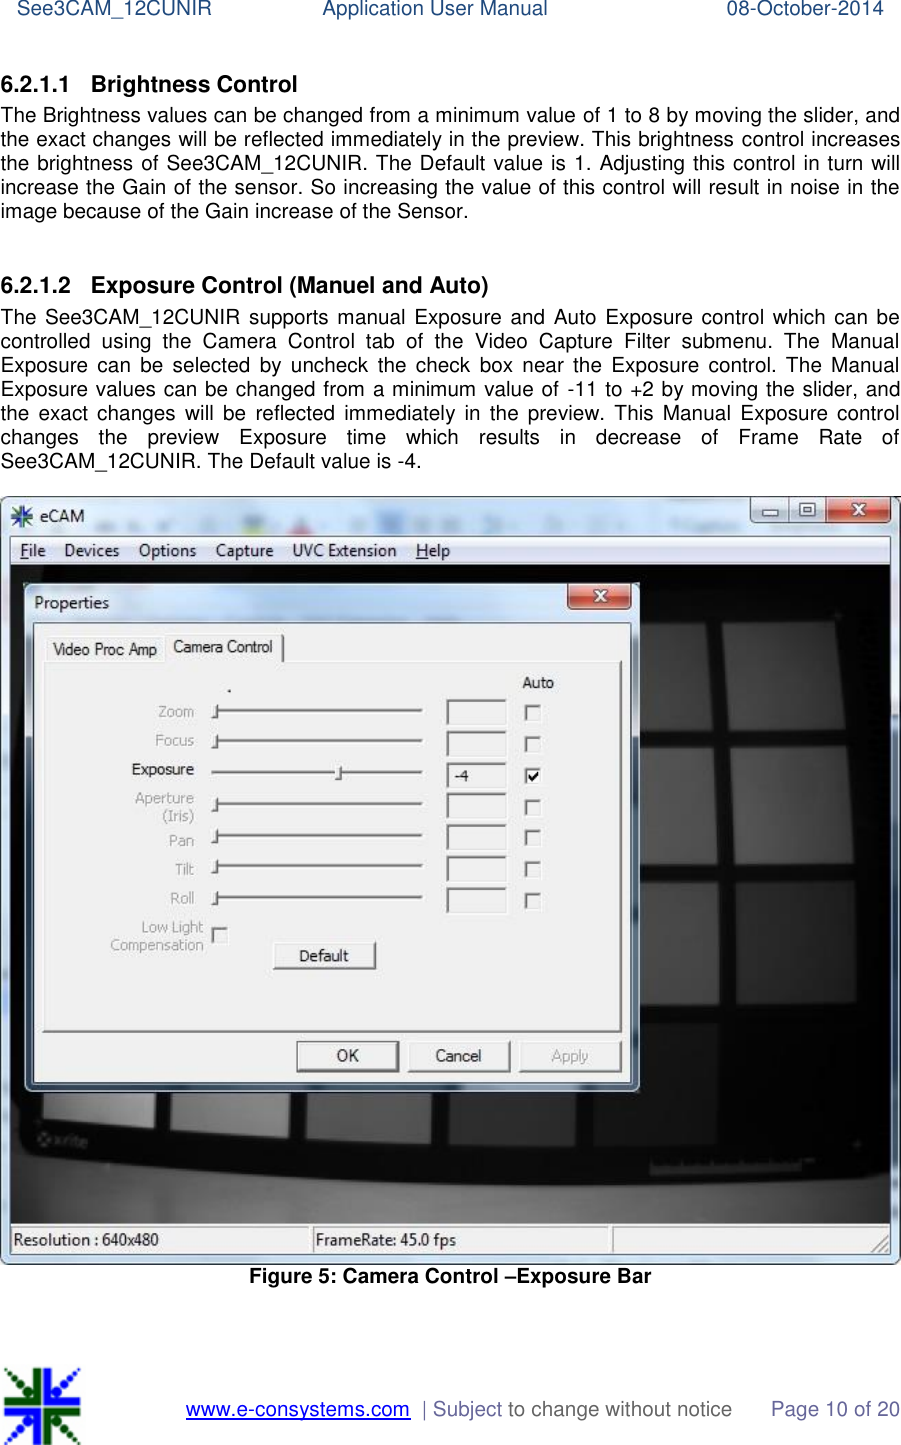 E con See3CAM 12CUNIR Windows SW CAMView App User Manual